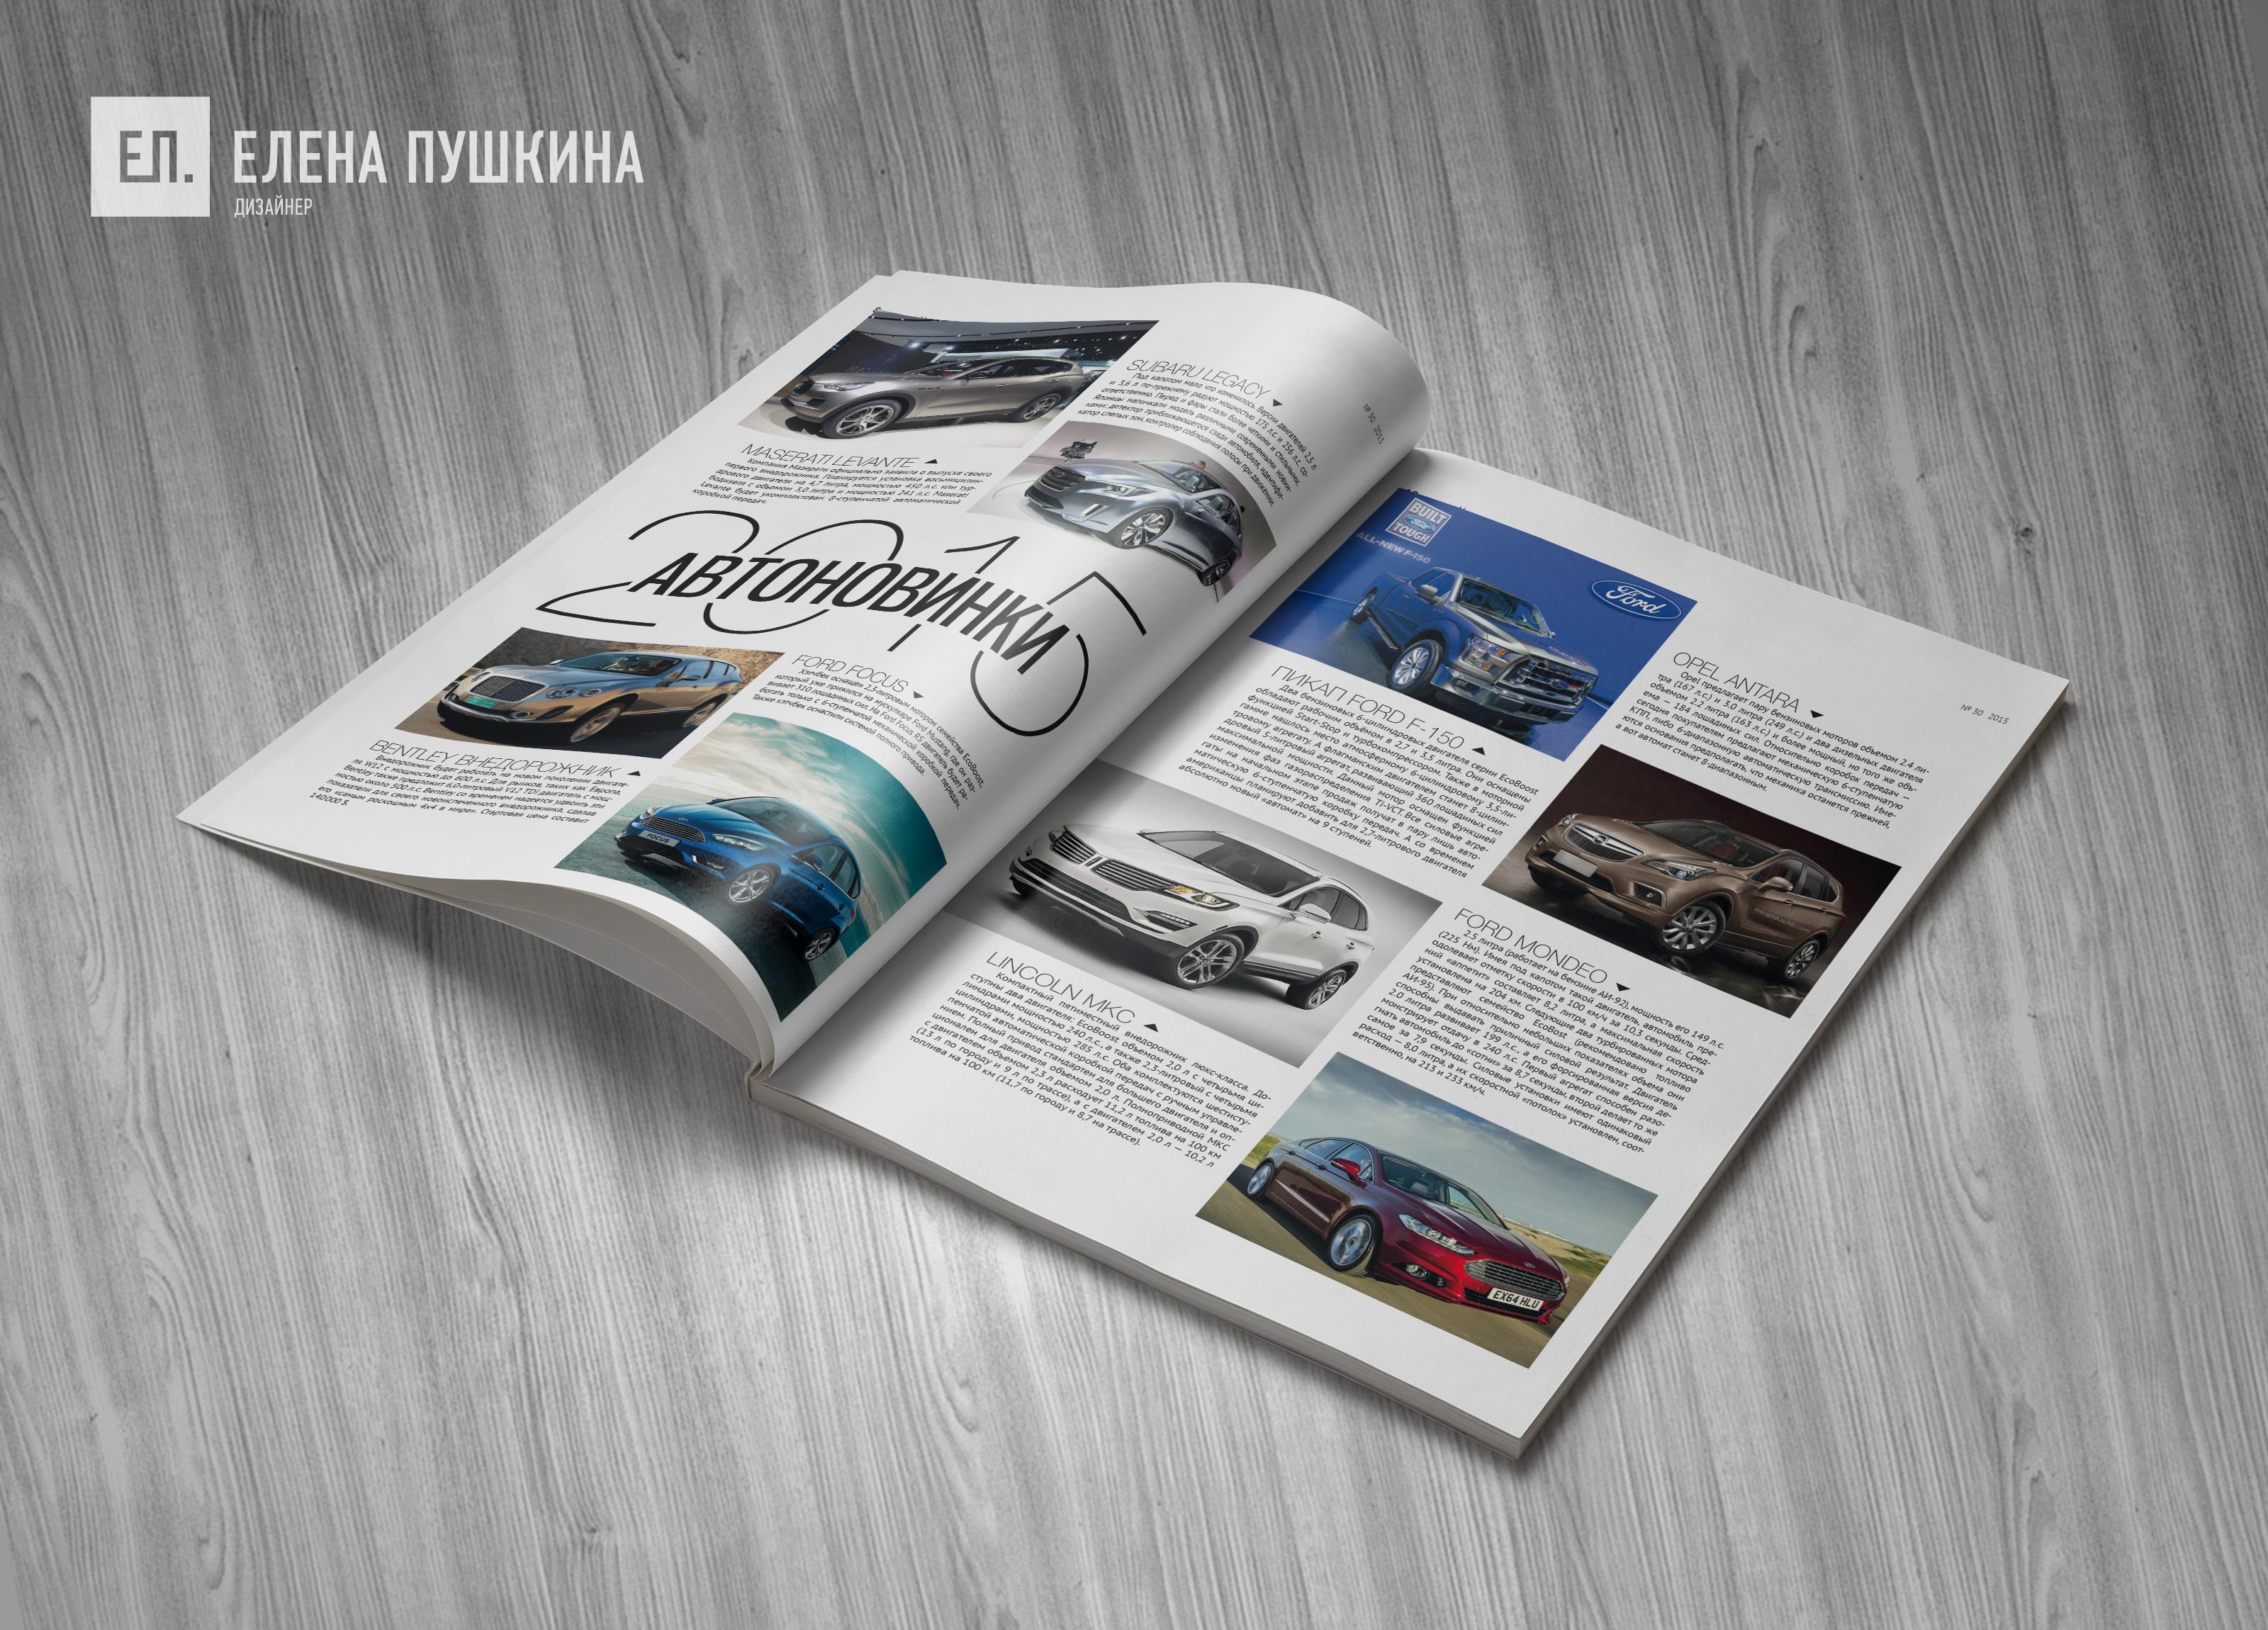 Глянцевый журнал «CoolBaba» №31 2015— разработка дизайна ивёрстка журнала Разработка журналов Портфолио